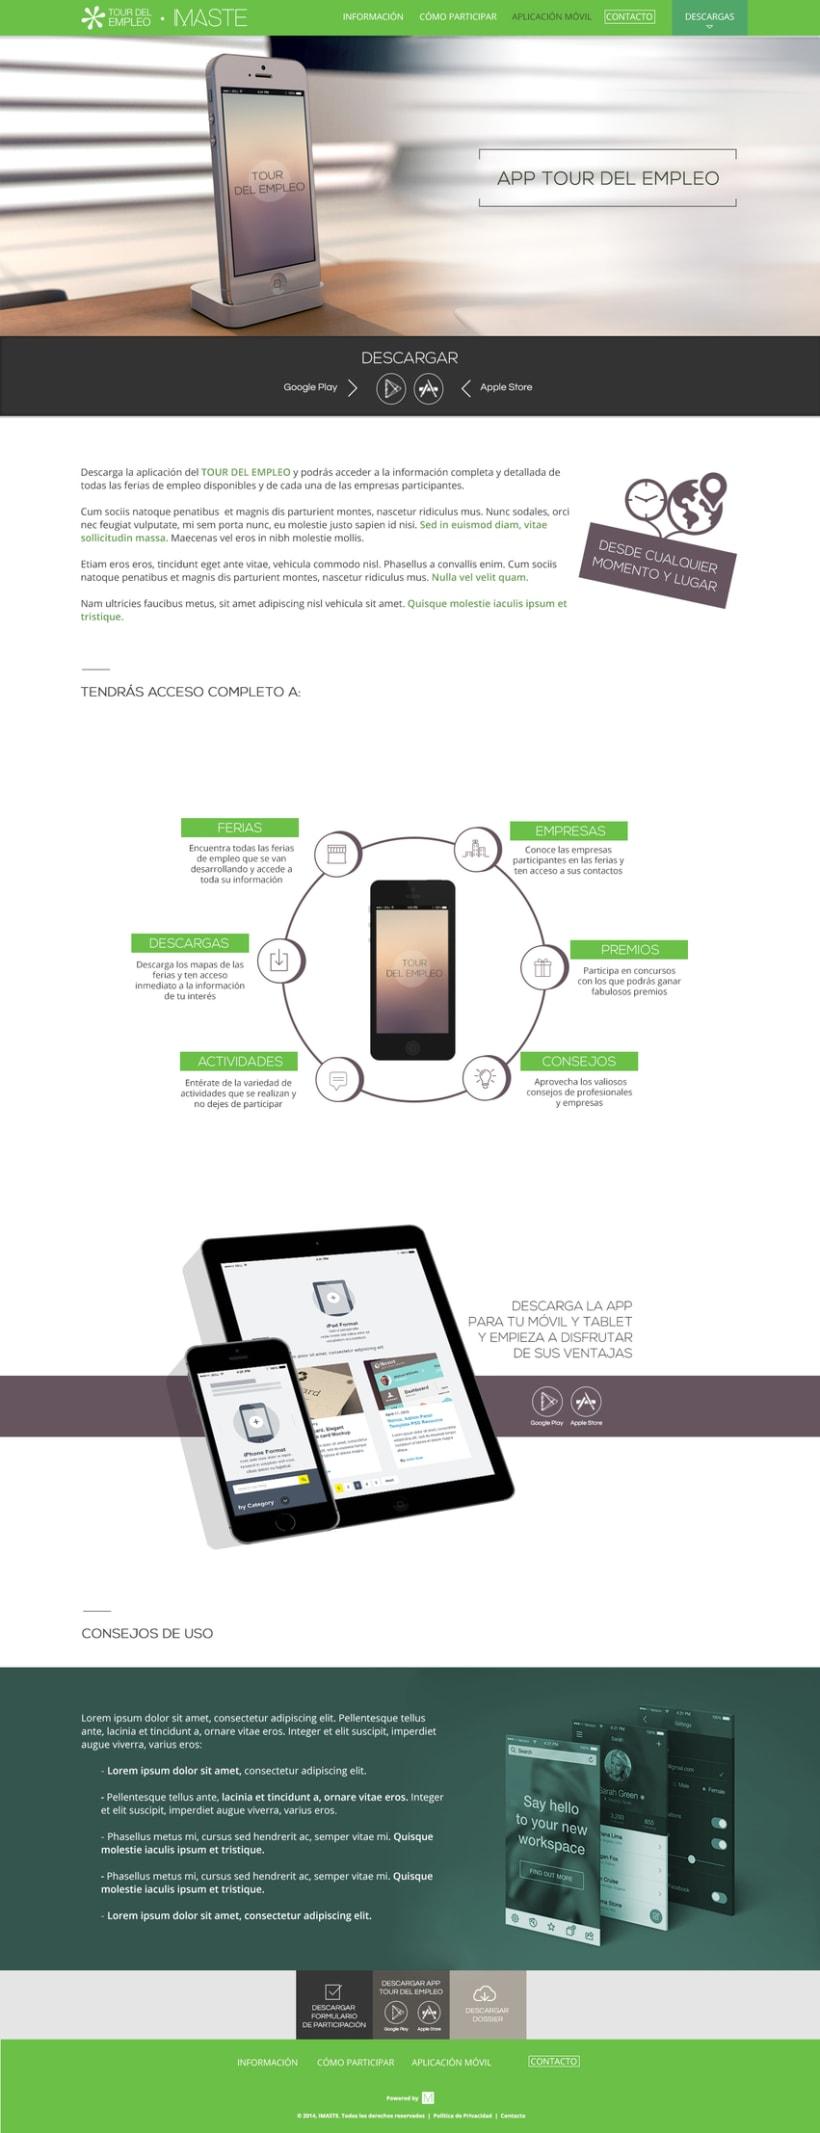 Web design & development for job fair sites 3